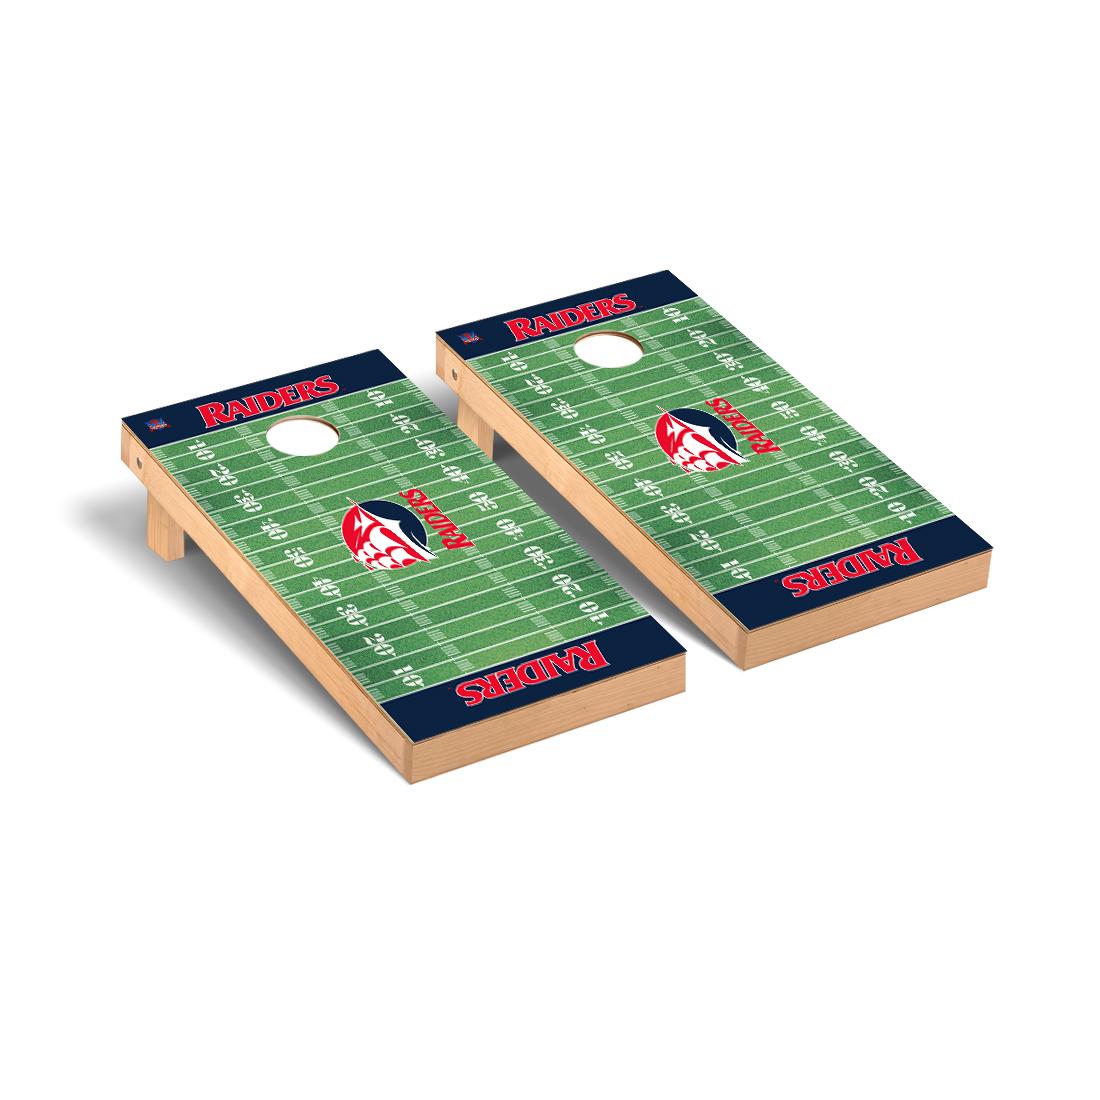 Shippensburg Red Raiders Cornhole Game Set Football Version